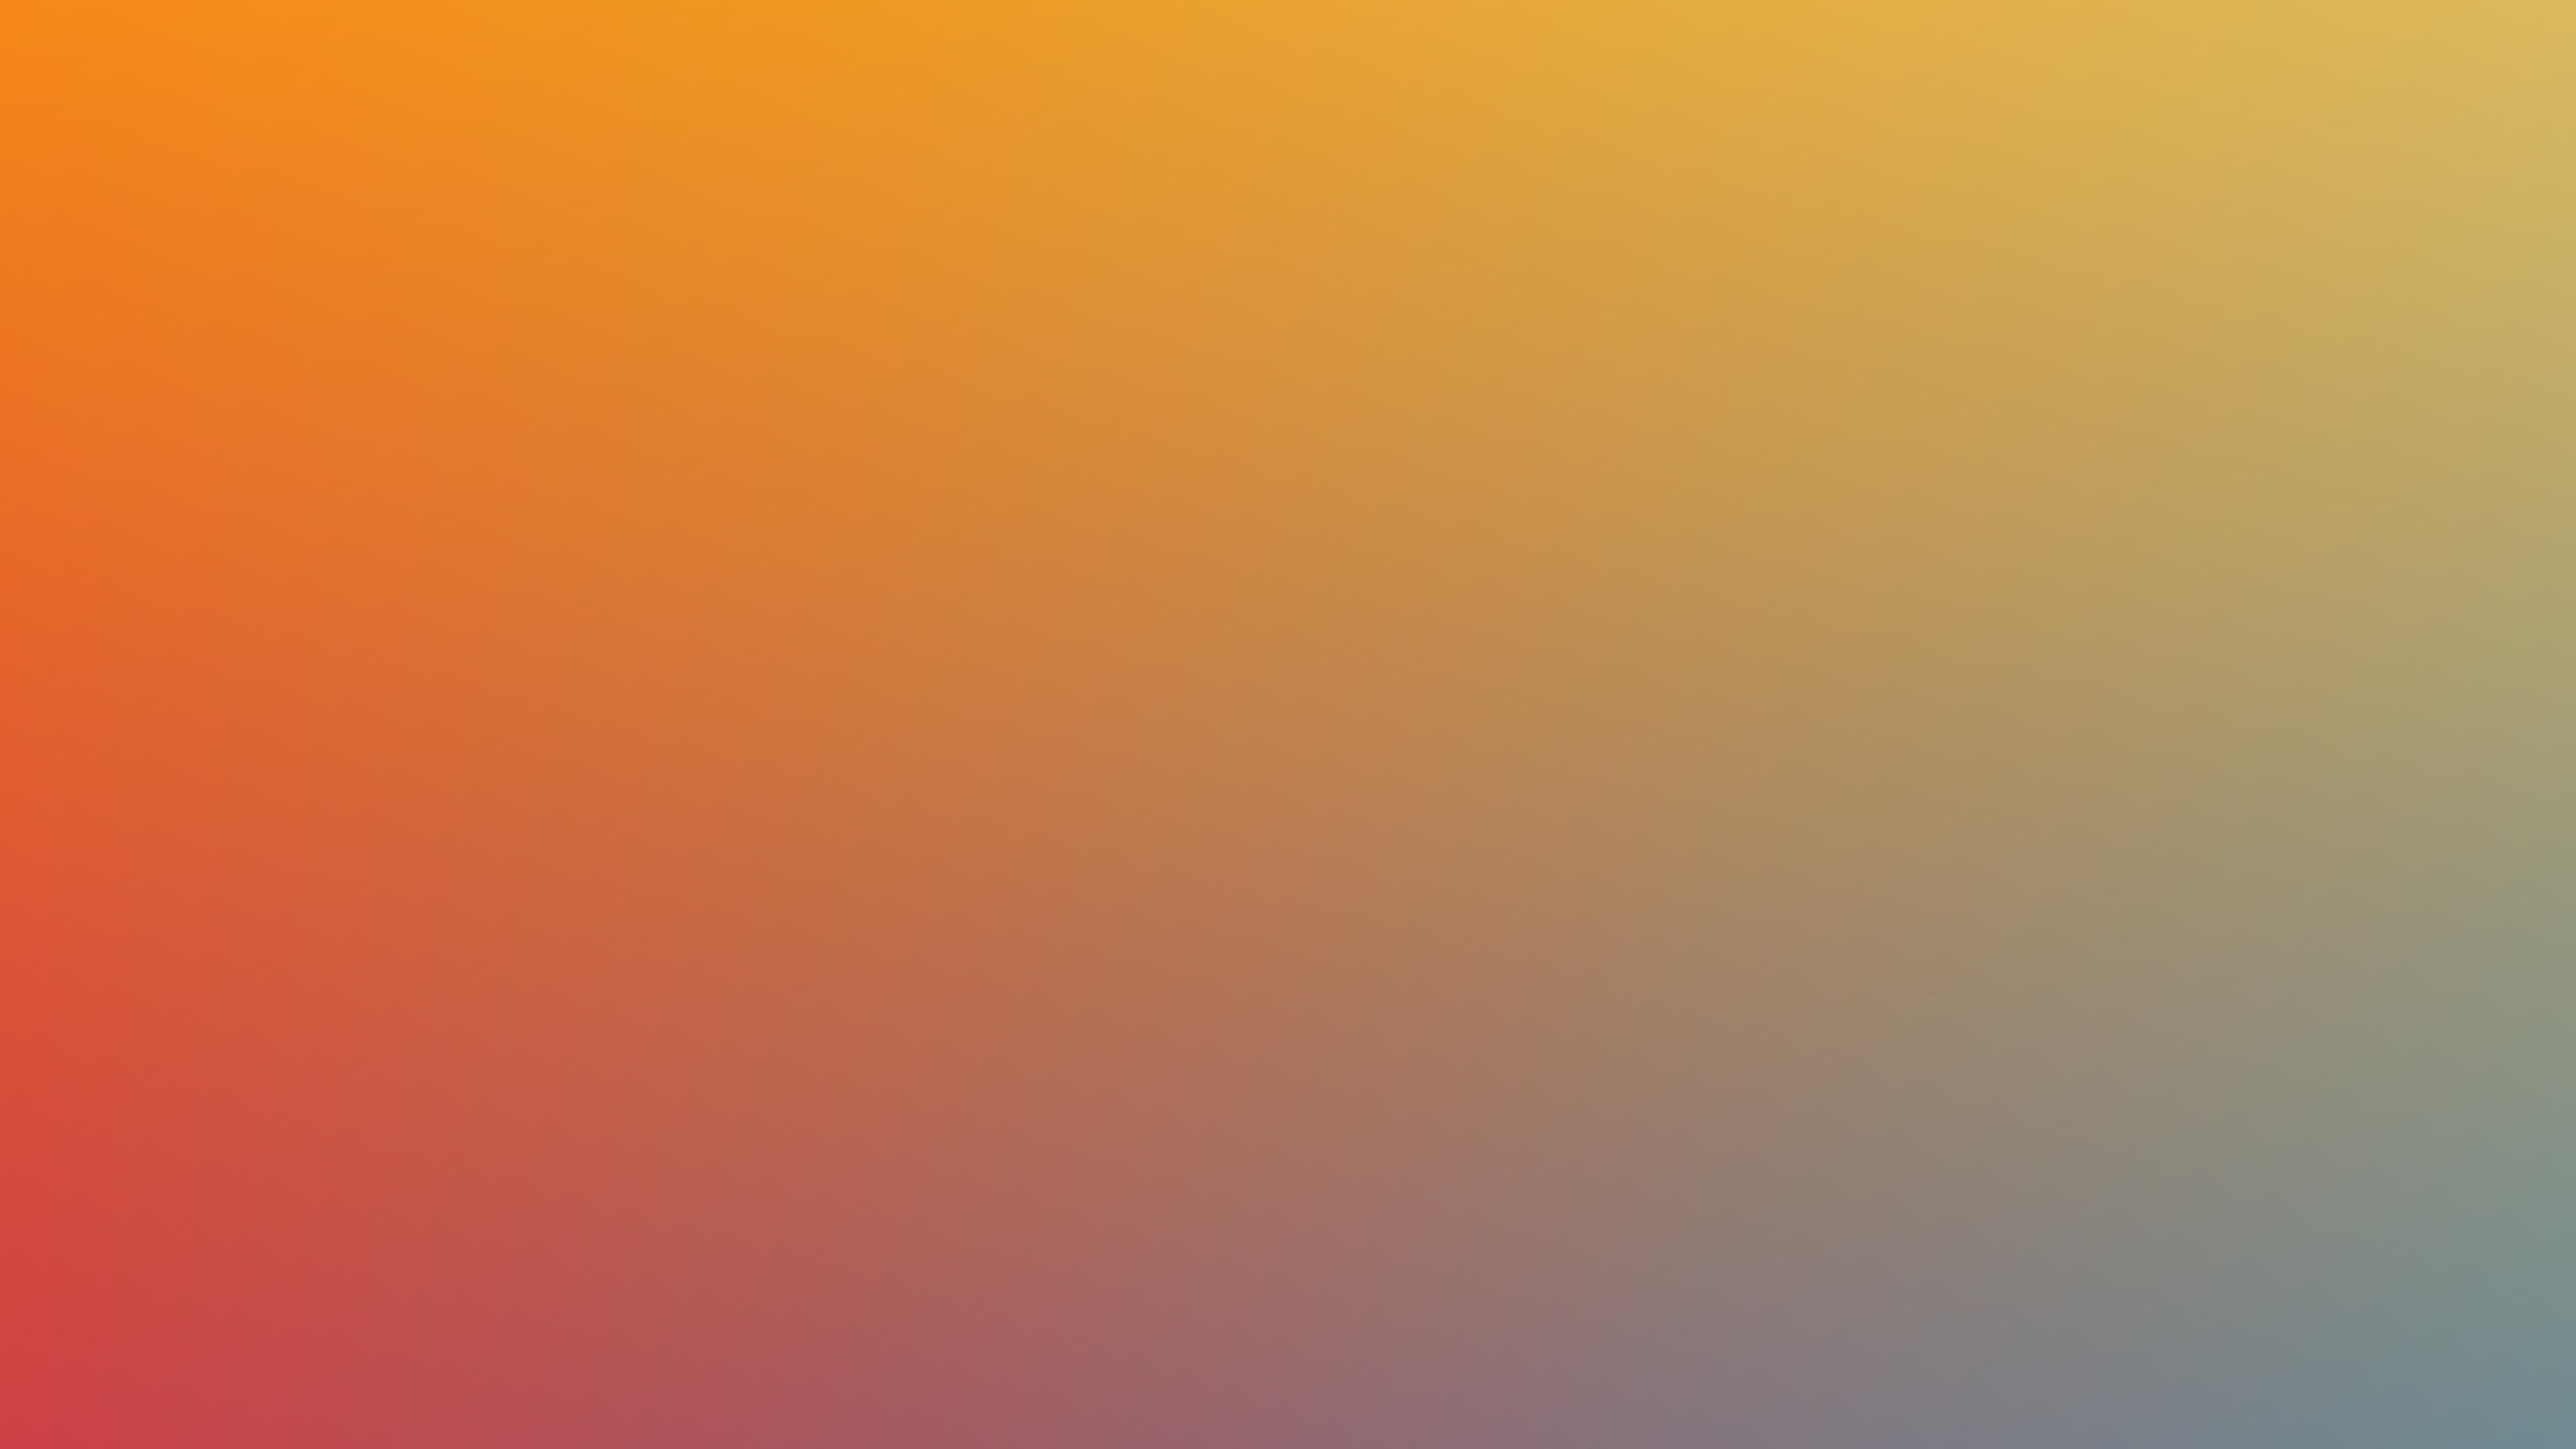 Gradient Mesh Minimal, HD 4K Wallpaper